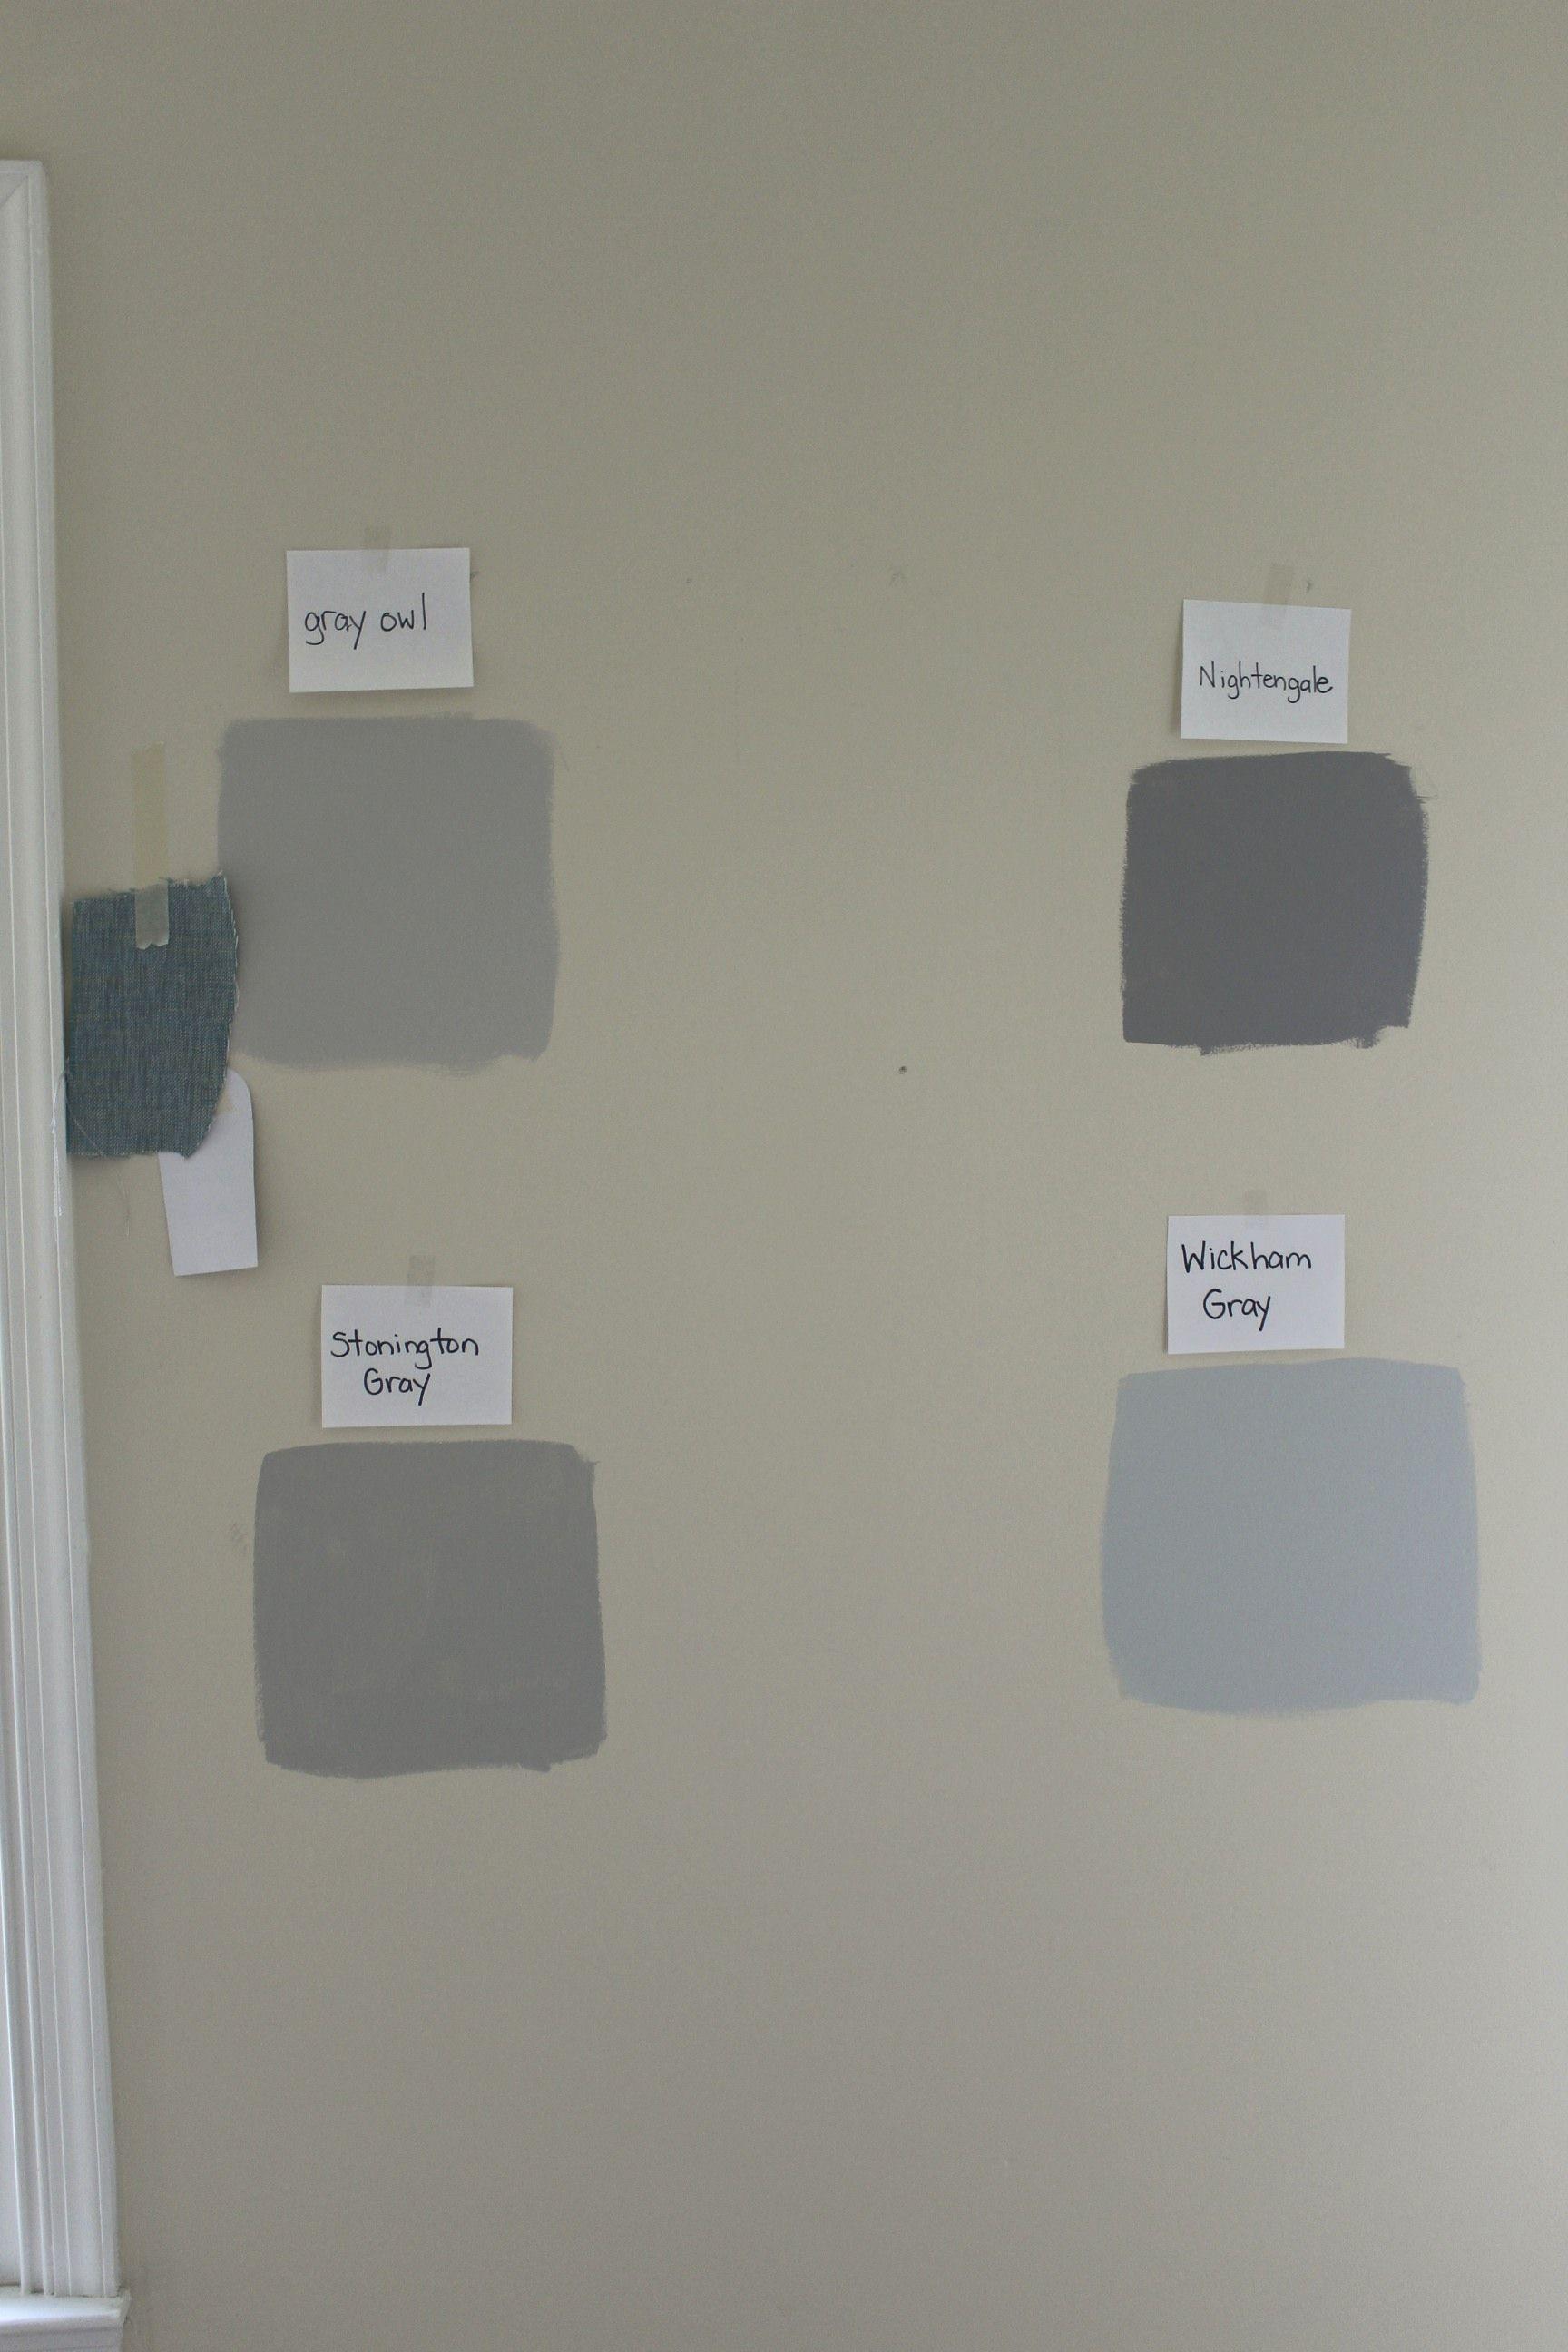 benjamin moore gray owl vs stonington gray | making a house a home